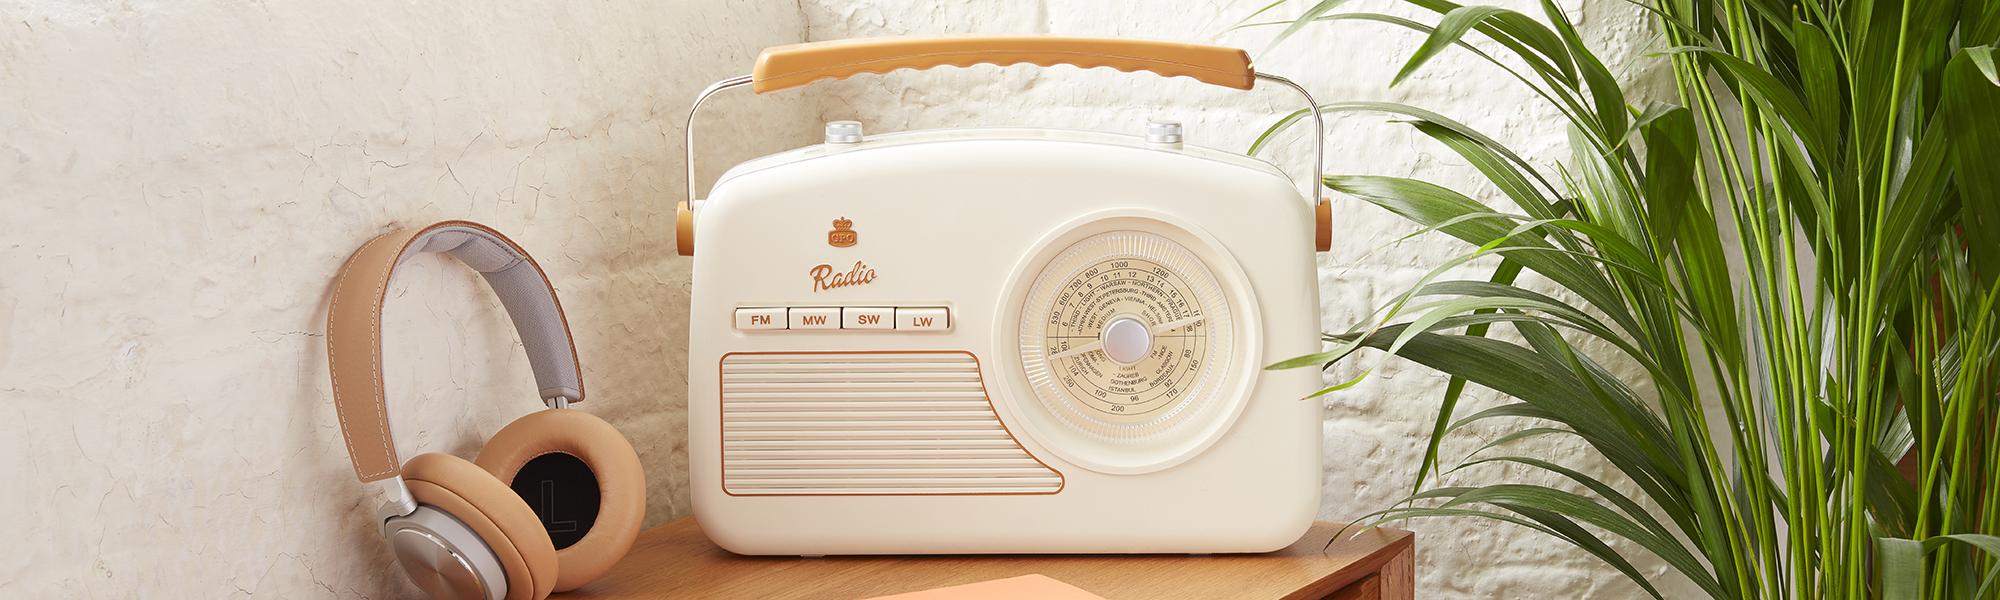 Retro Radio Bluetooth,Retro AM FM Radios,AM FM Bluetooth Radio